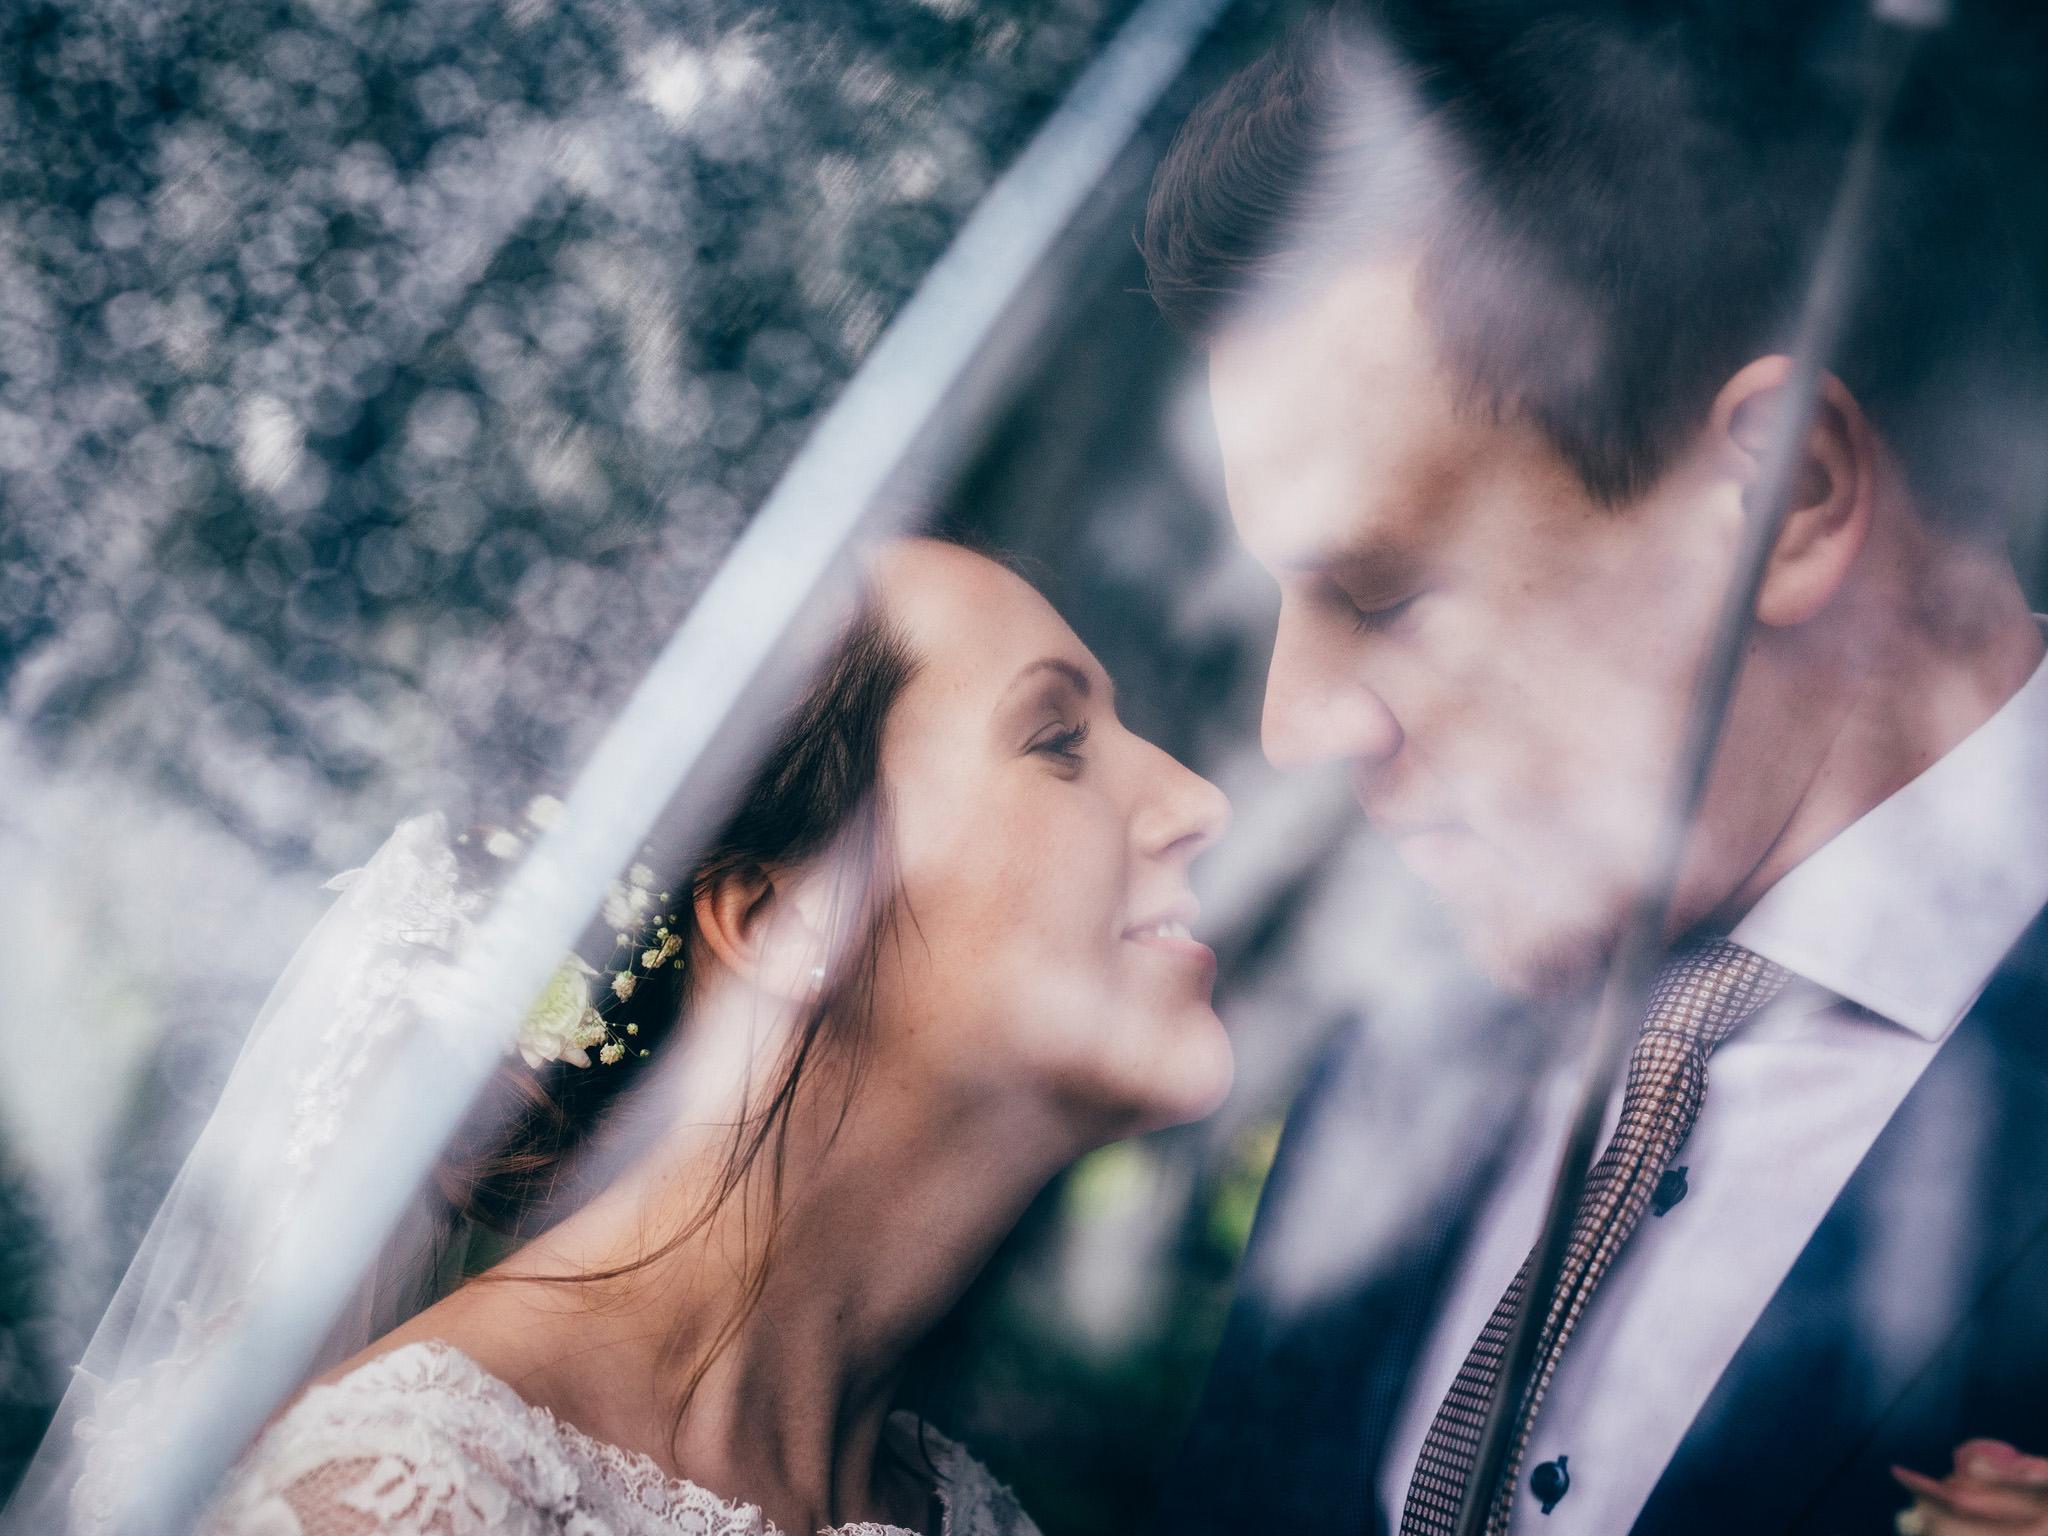 Norway+wedding+photographer+elopement+pre+wedding+Casey+Arneson-69.jpg